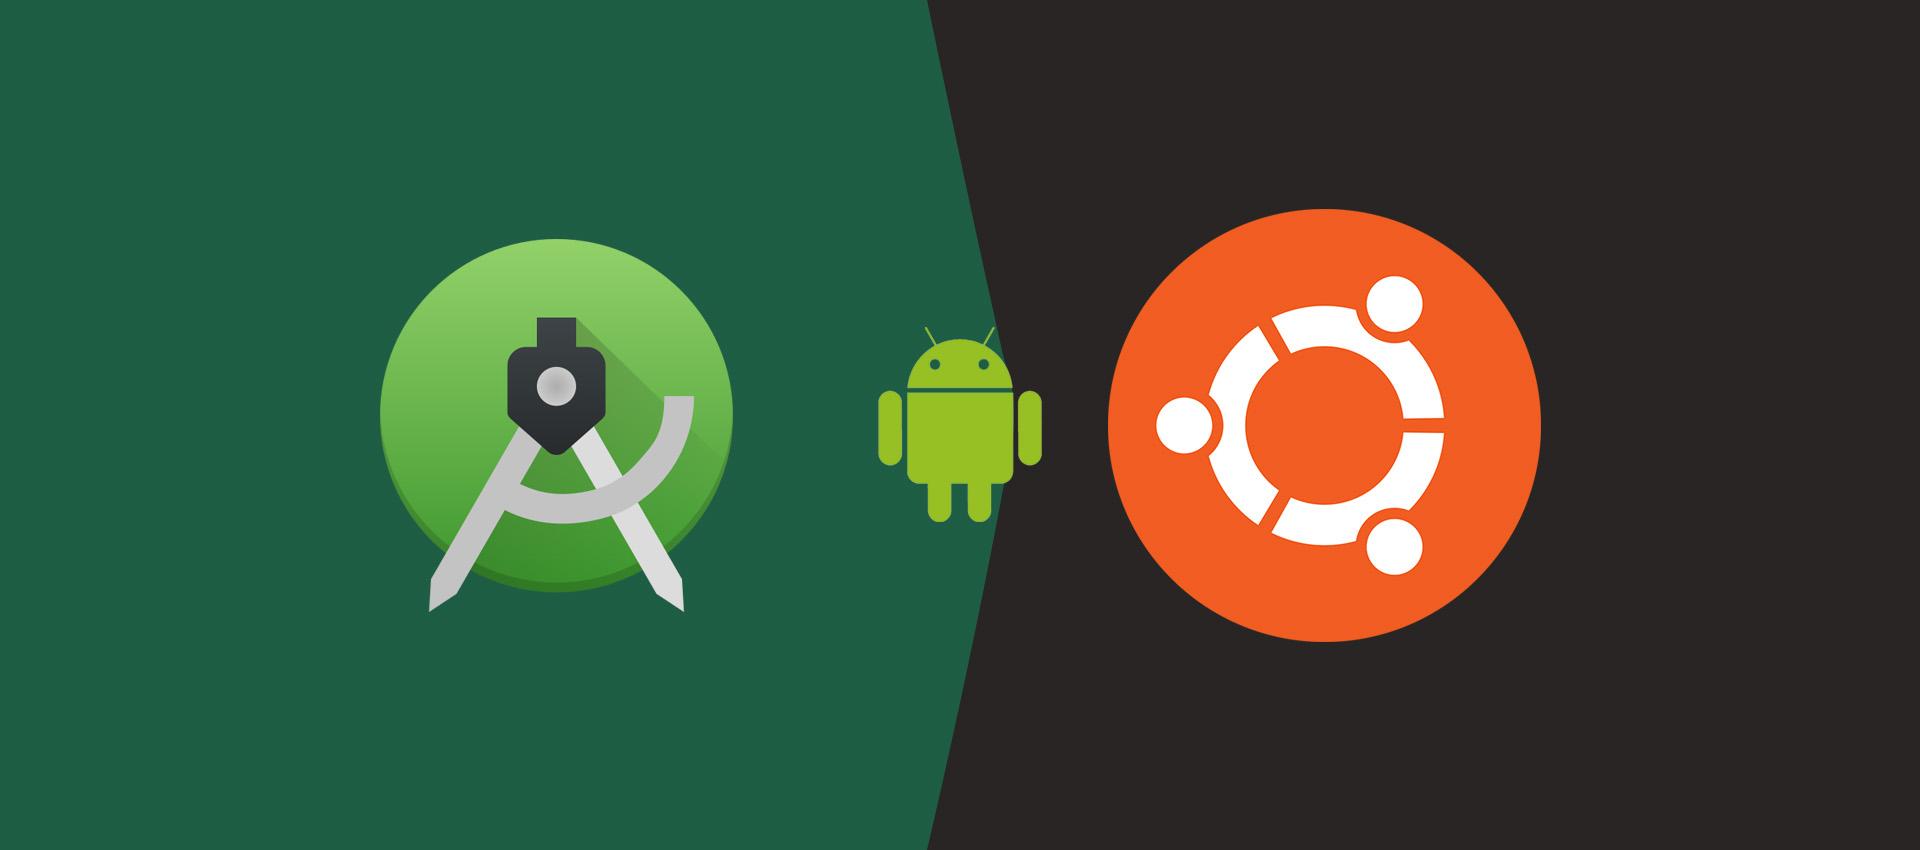 How To Install Android Studio On Ubuntu 20.04